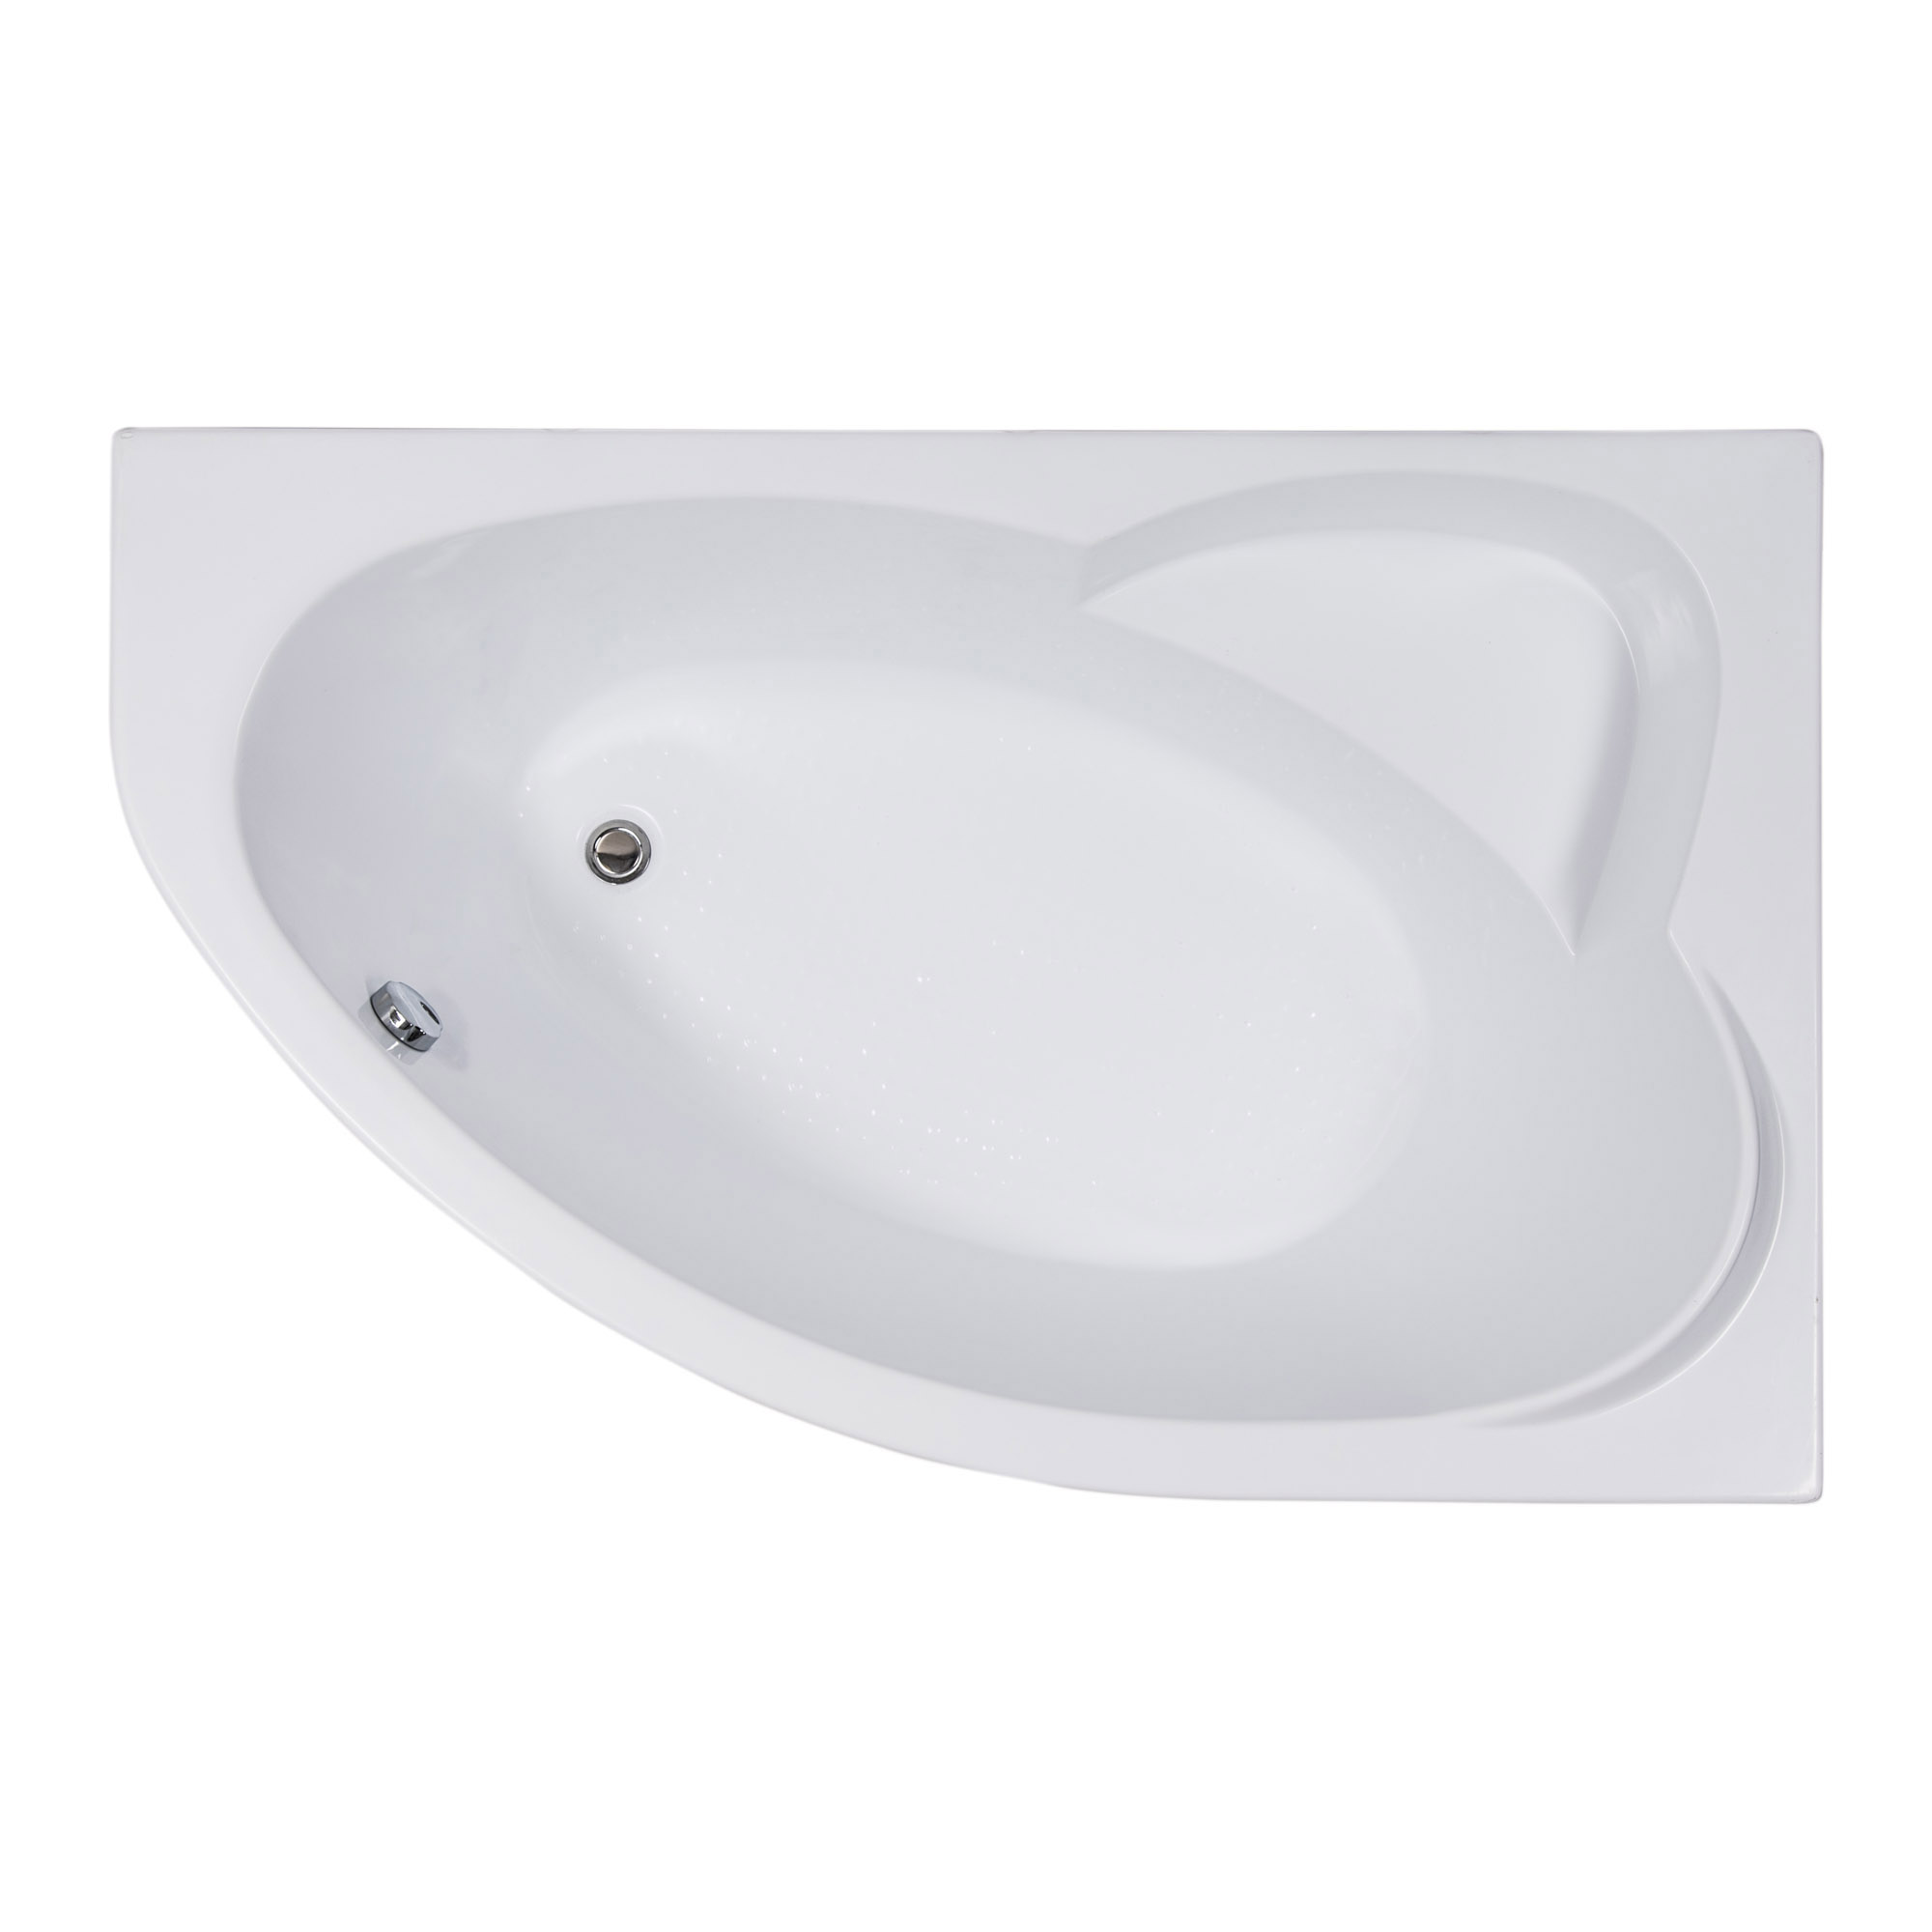 Акриловая ванна Aquanet Sarezo 160x100 R без гидромассажа недорого